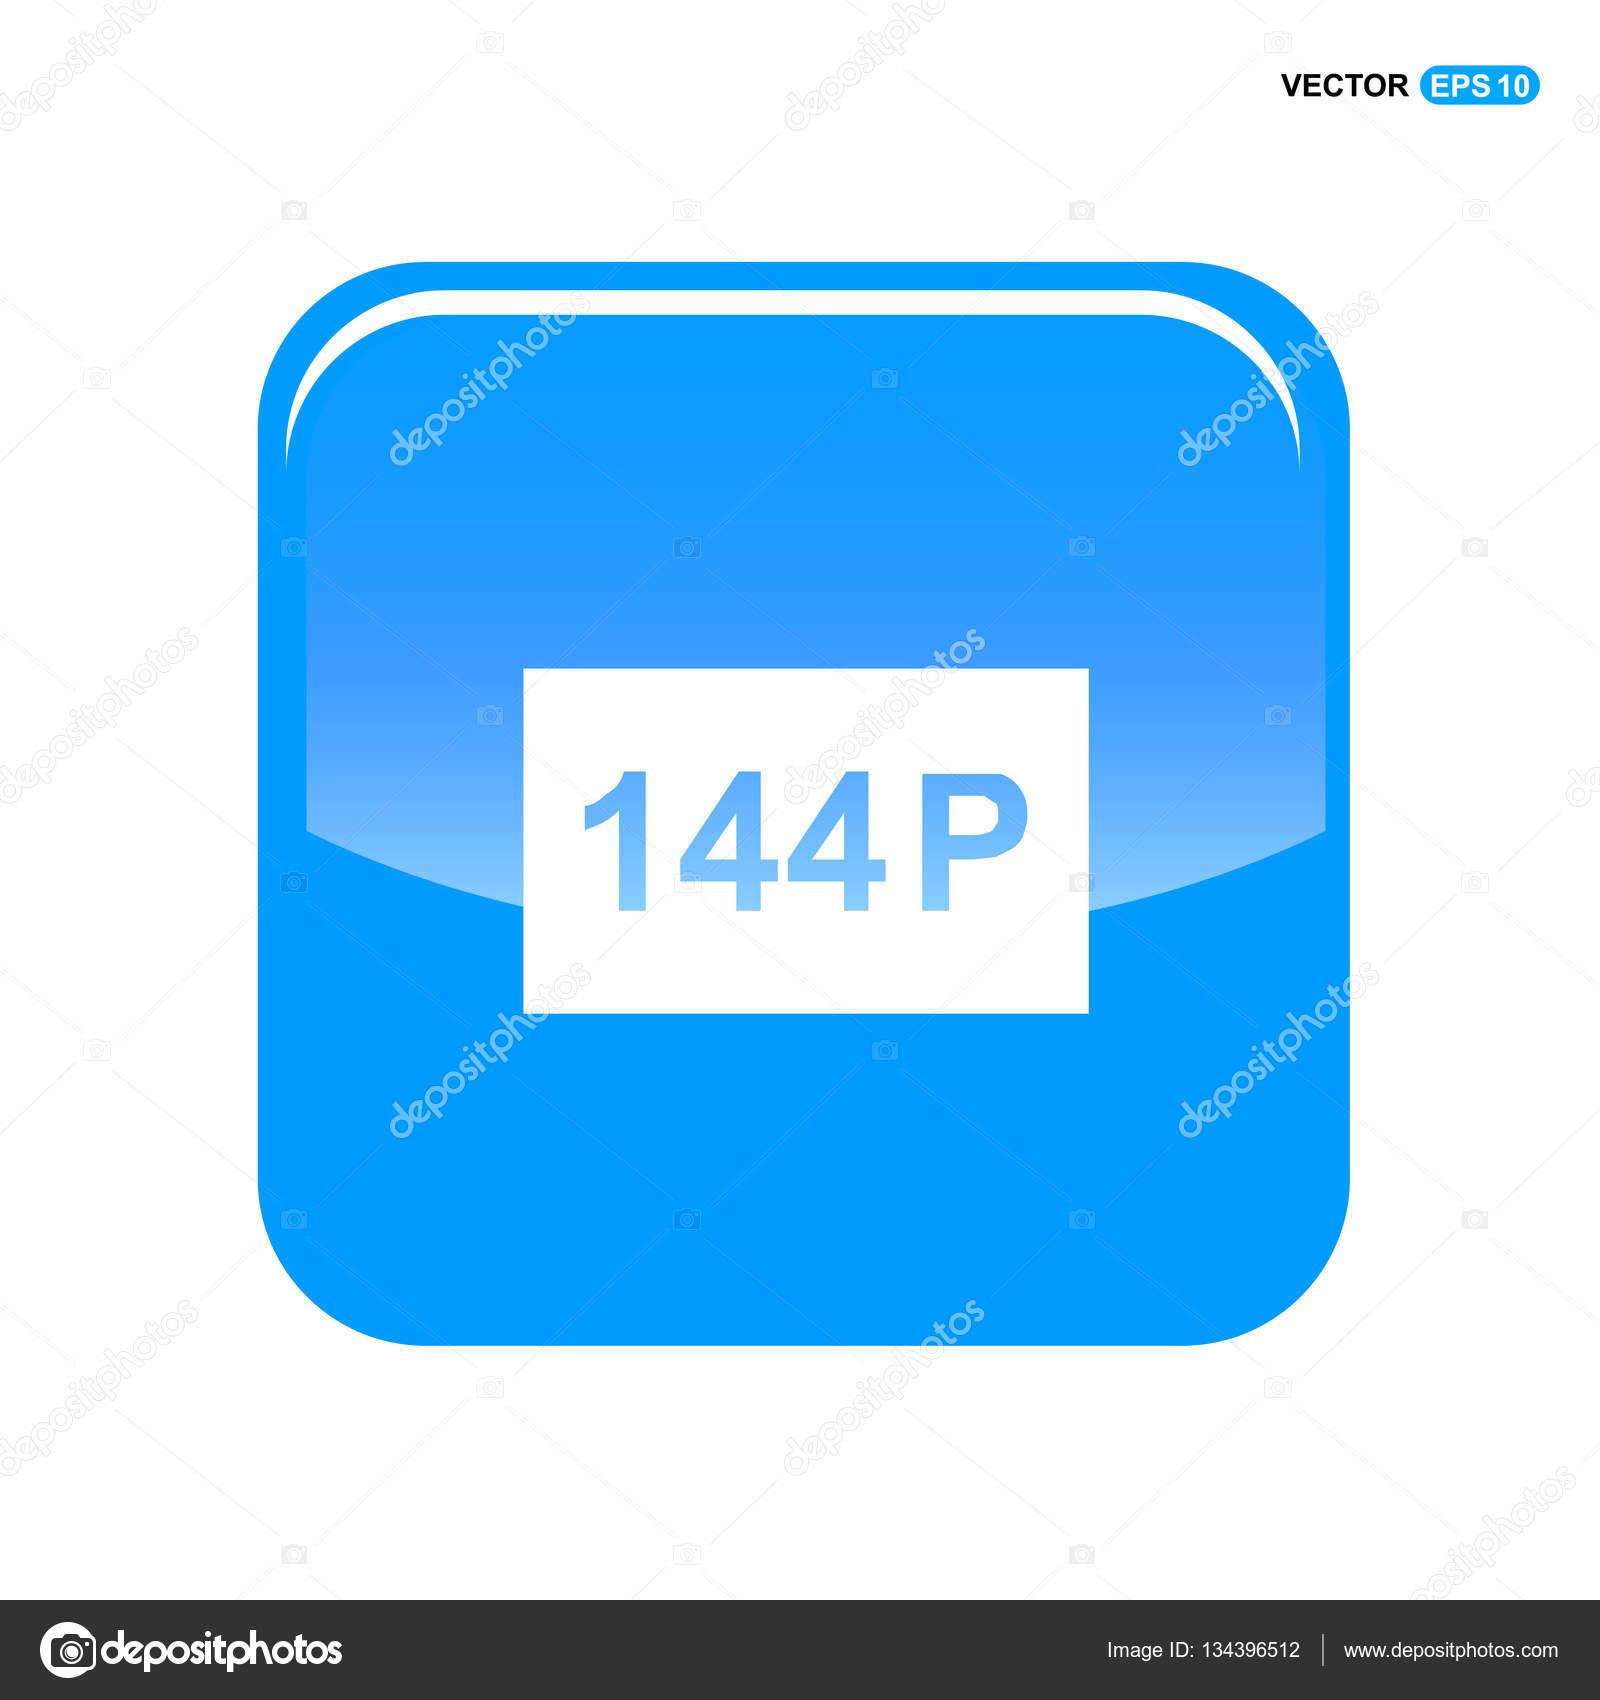 Cone de vdeo resoluo de pixels vetor de stock ibrandify cone de vdeo resoluo de pixels vetor de stock ccuart Images